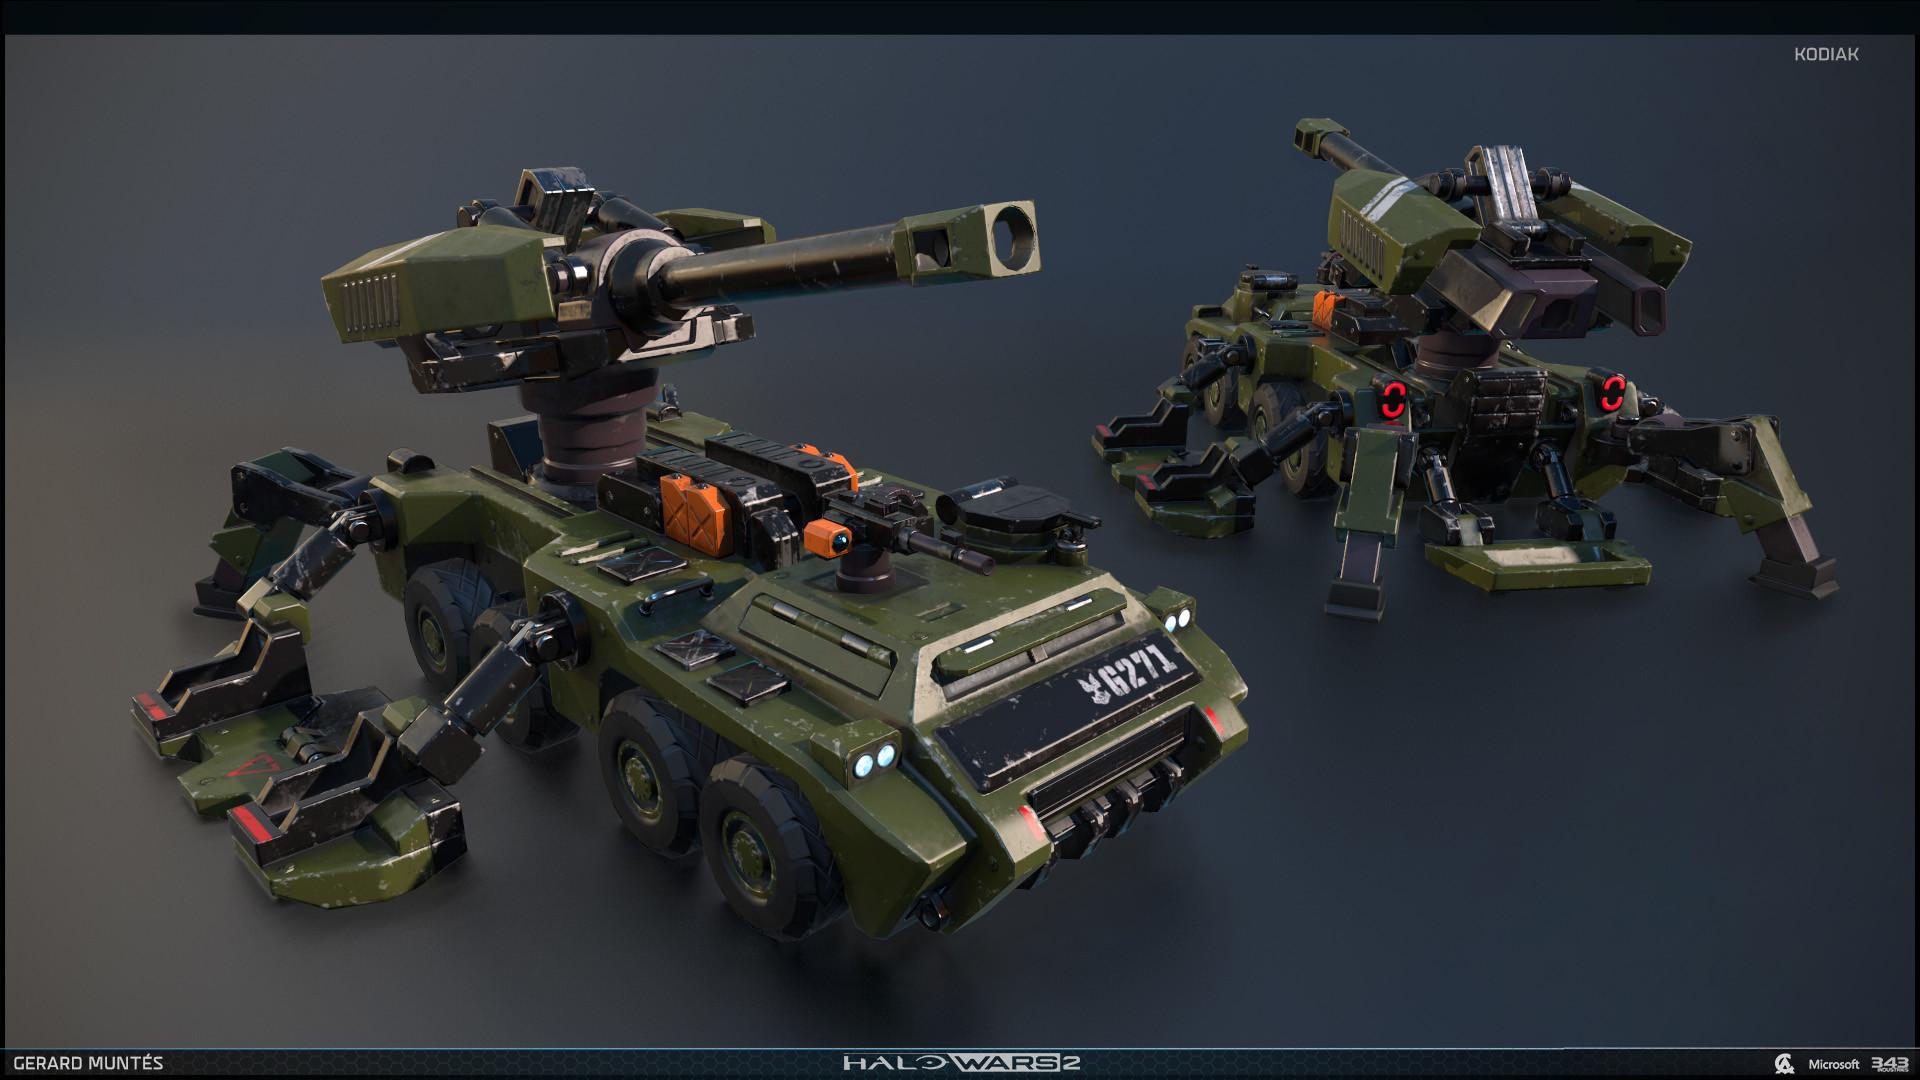 ArtStation - Halo wars 2 Kodiak, Gerard Muntés